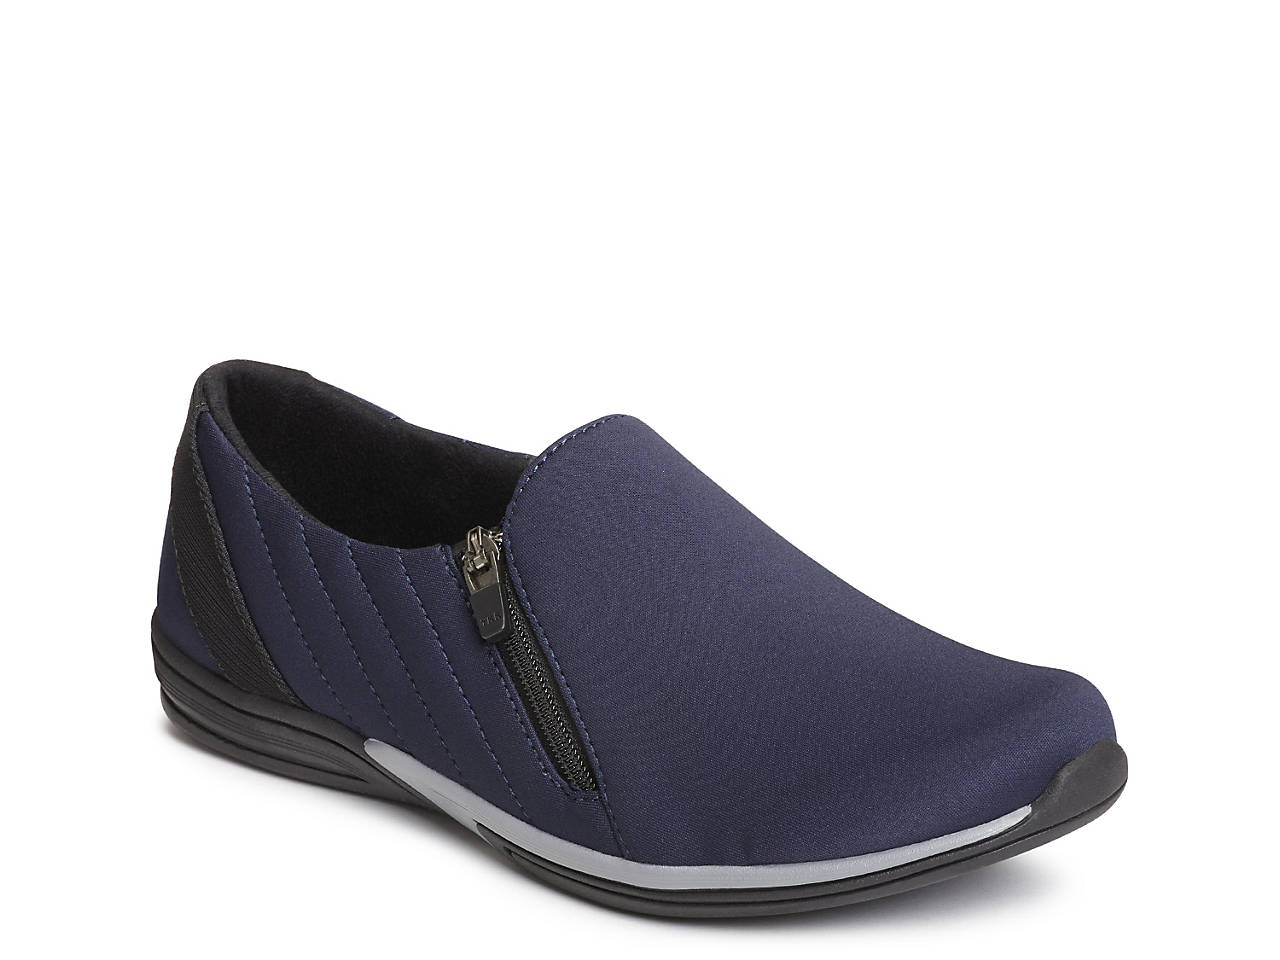 A2 by Aerosoles Envelope Sneakers SfhuoDI